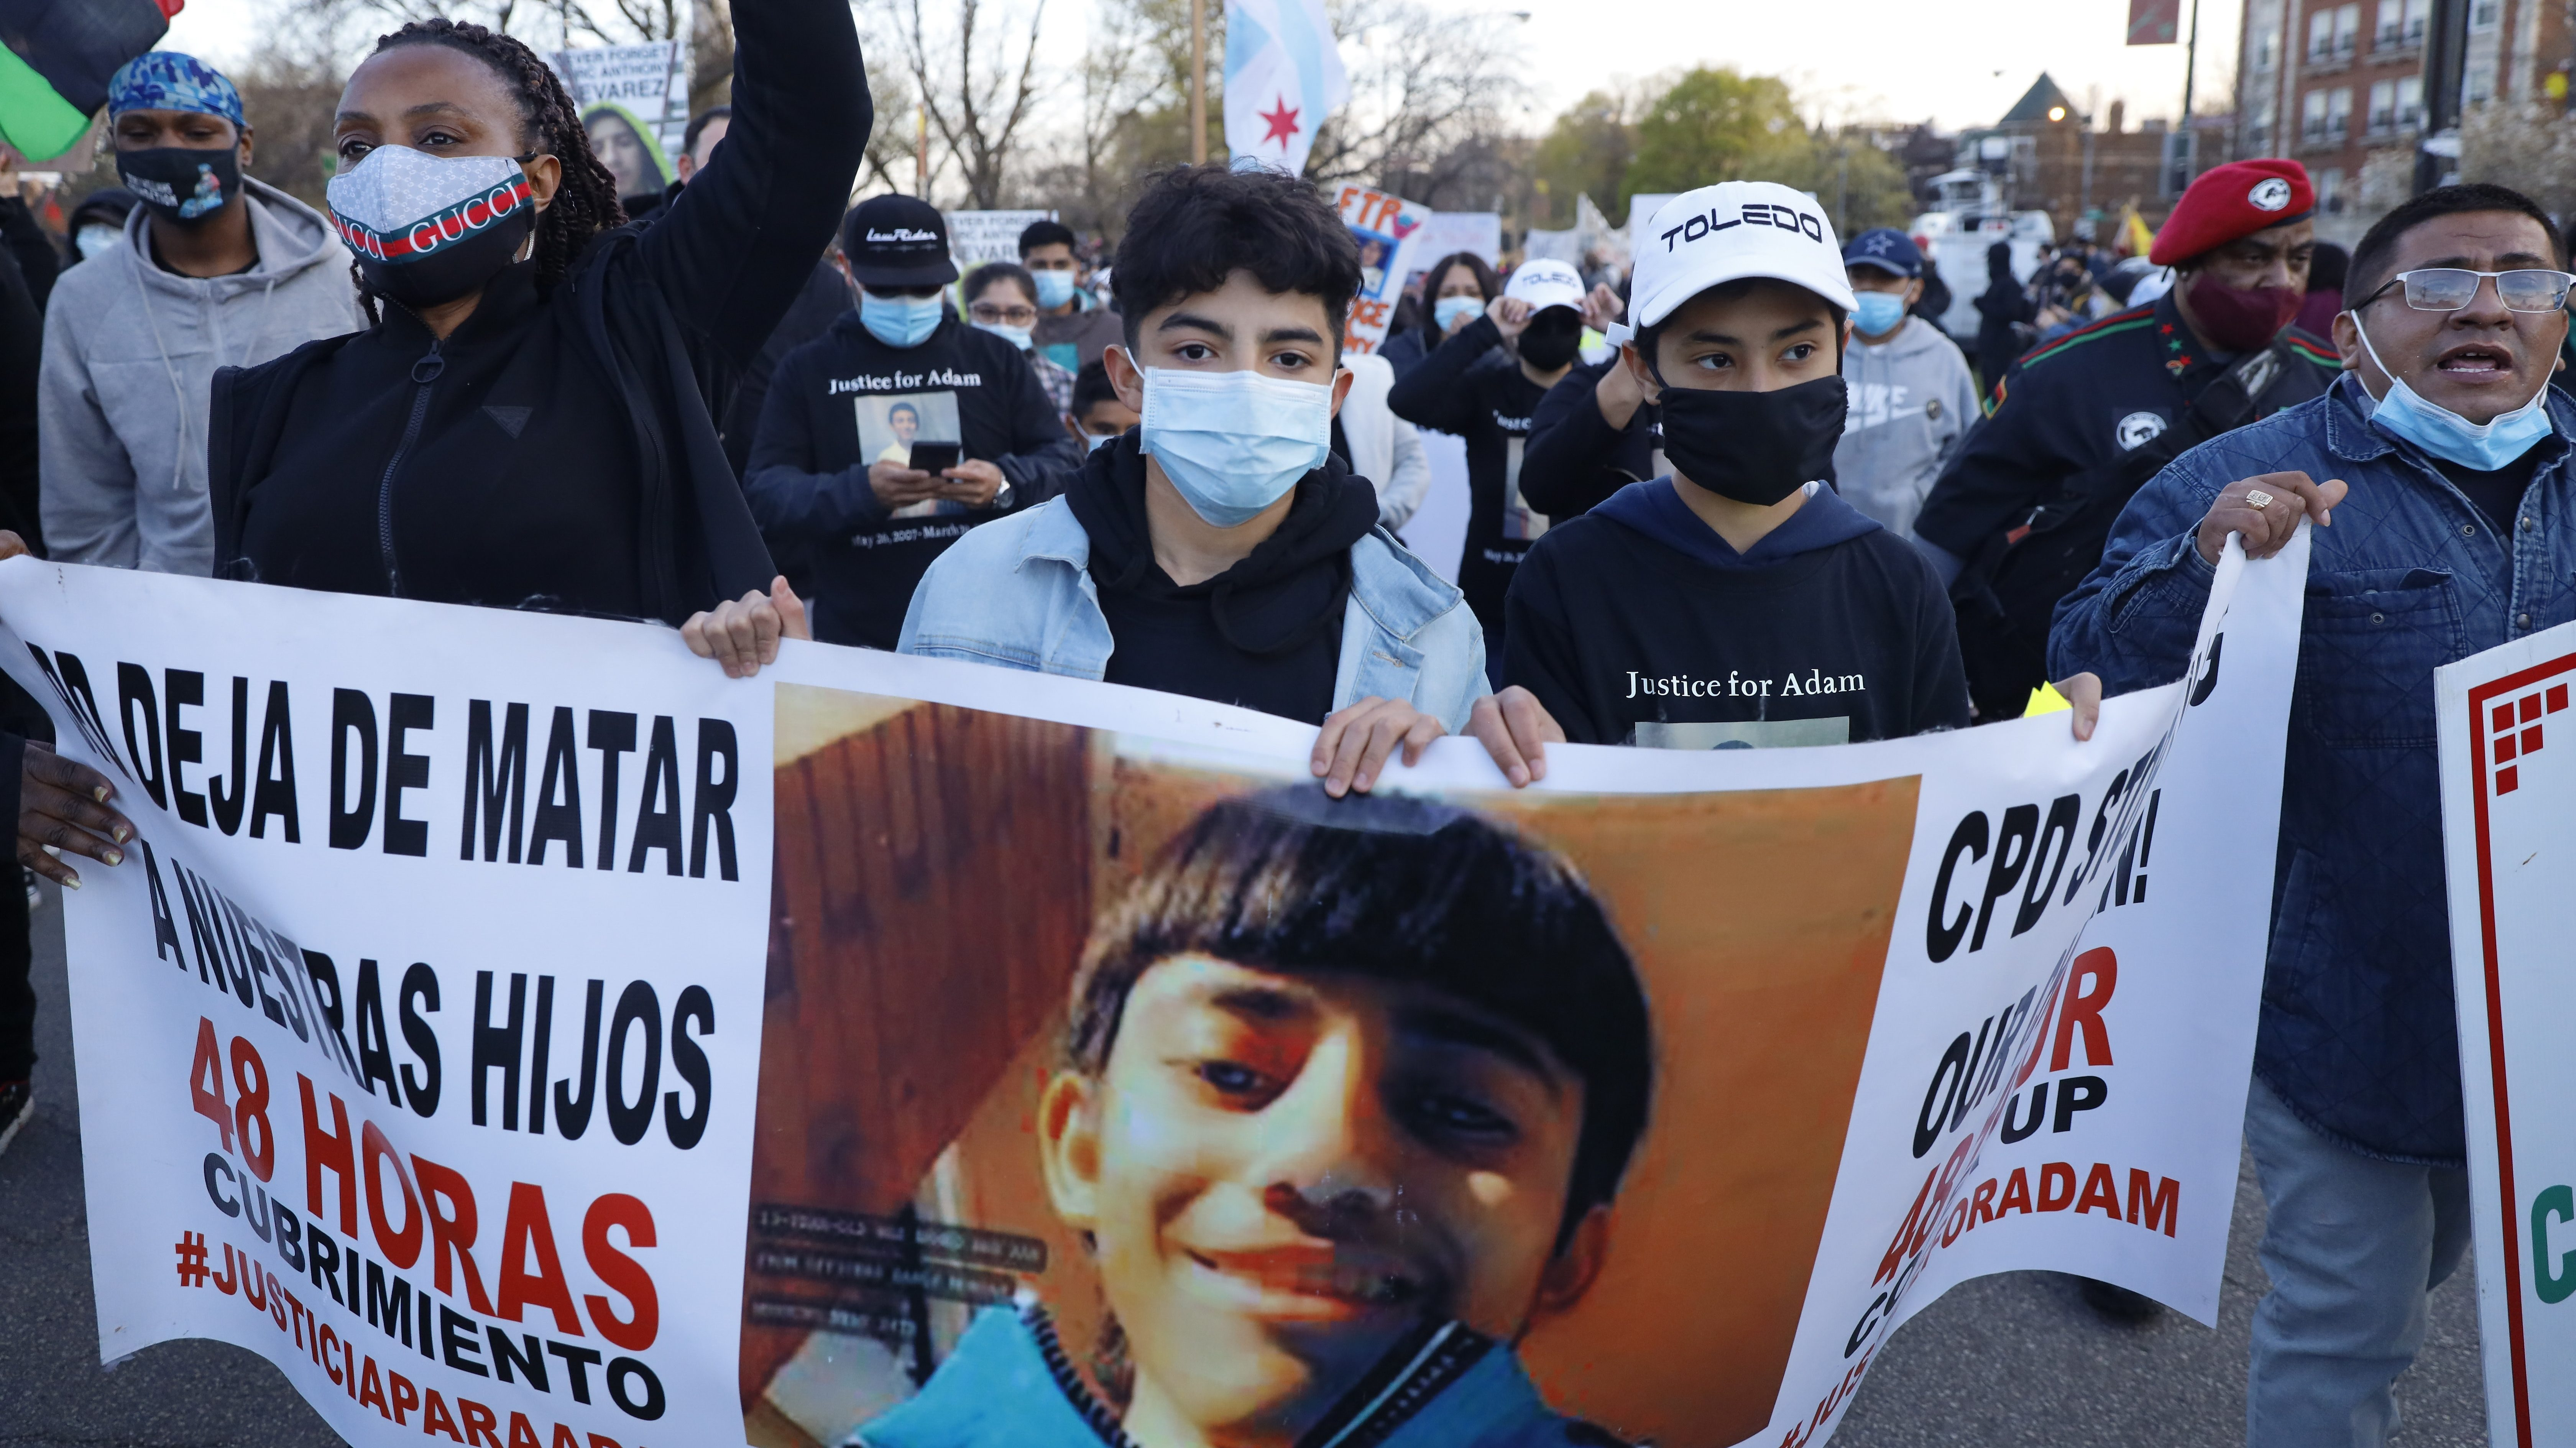 Demonstrators protest the shooting of 13-year-old Adam Toledo